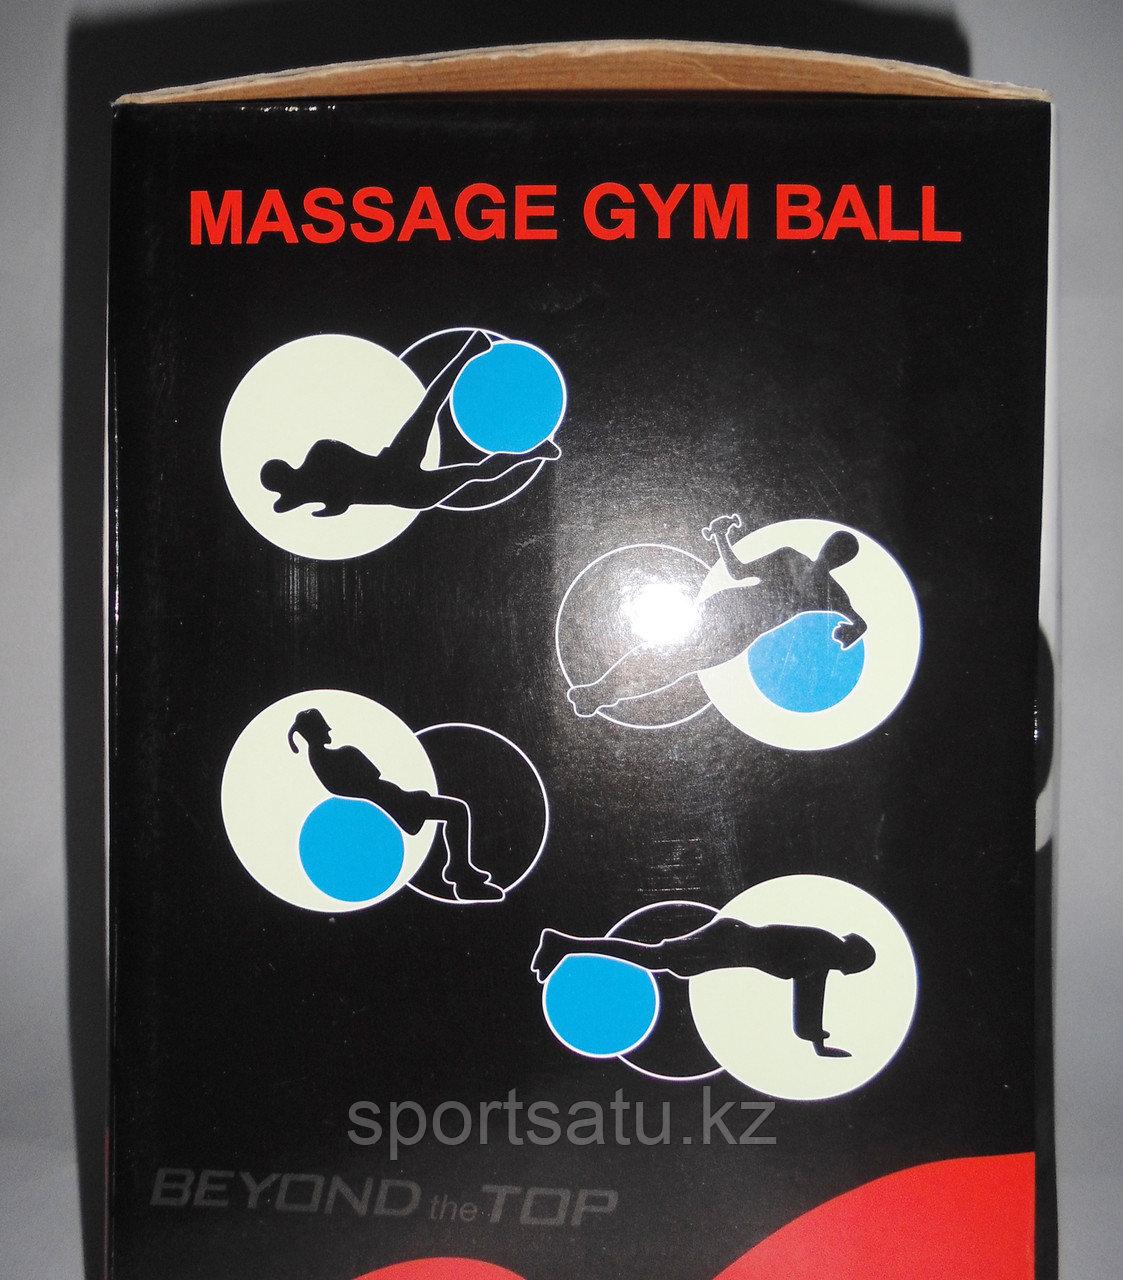 Гимнастический мяч MASSAGE GYM BALL - фото 4